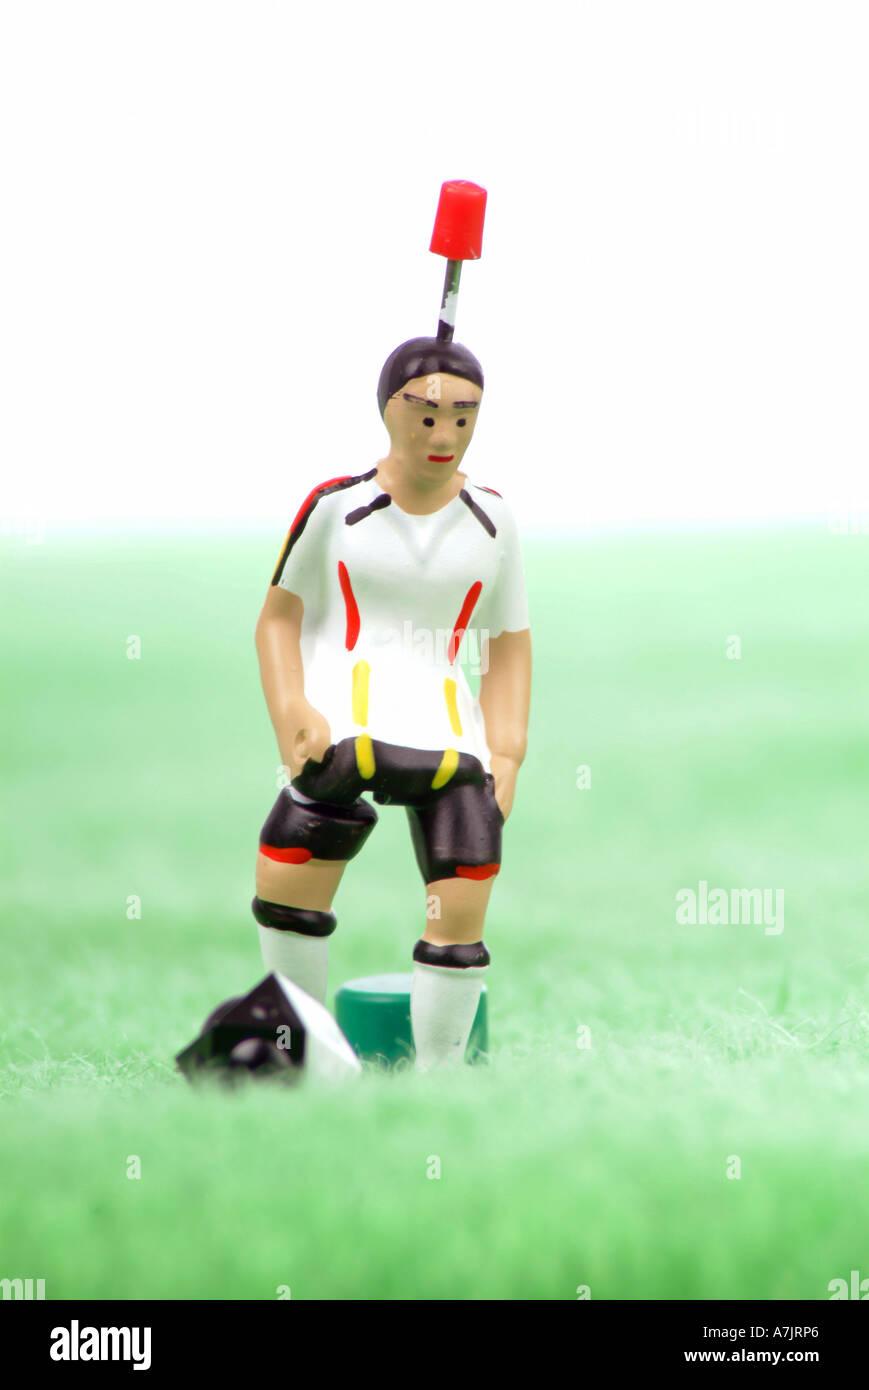 Fußballspiel Spieler soccer game player - Stock Image